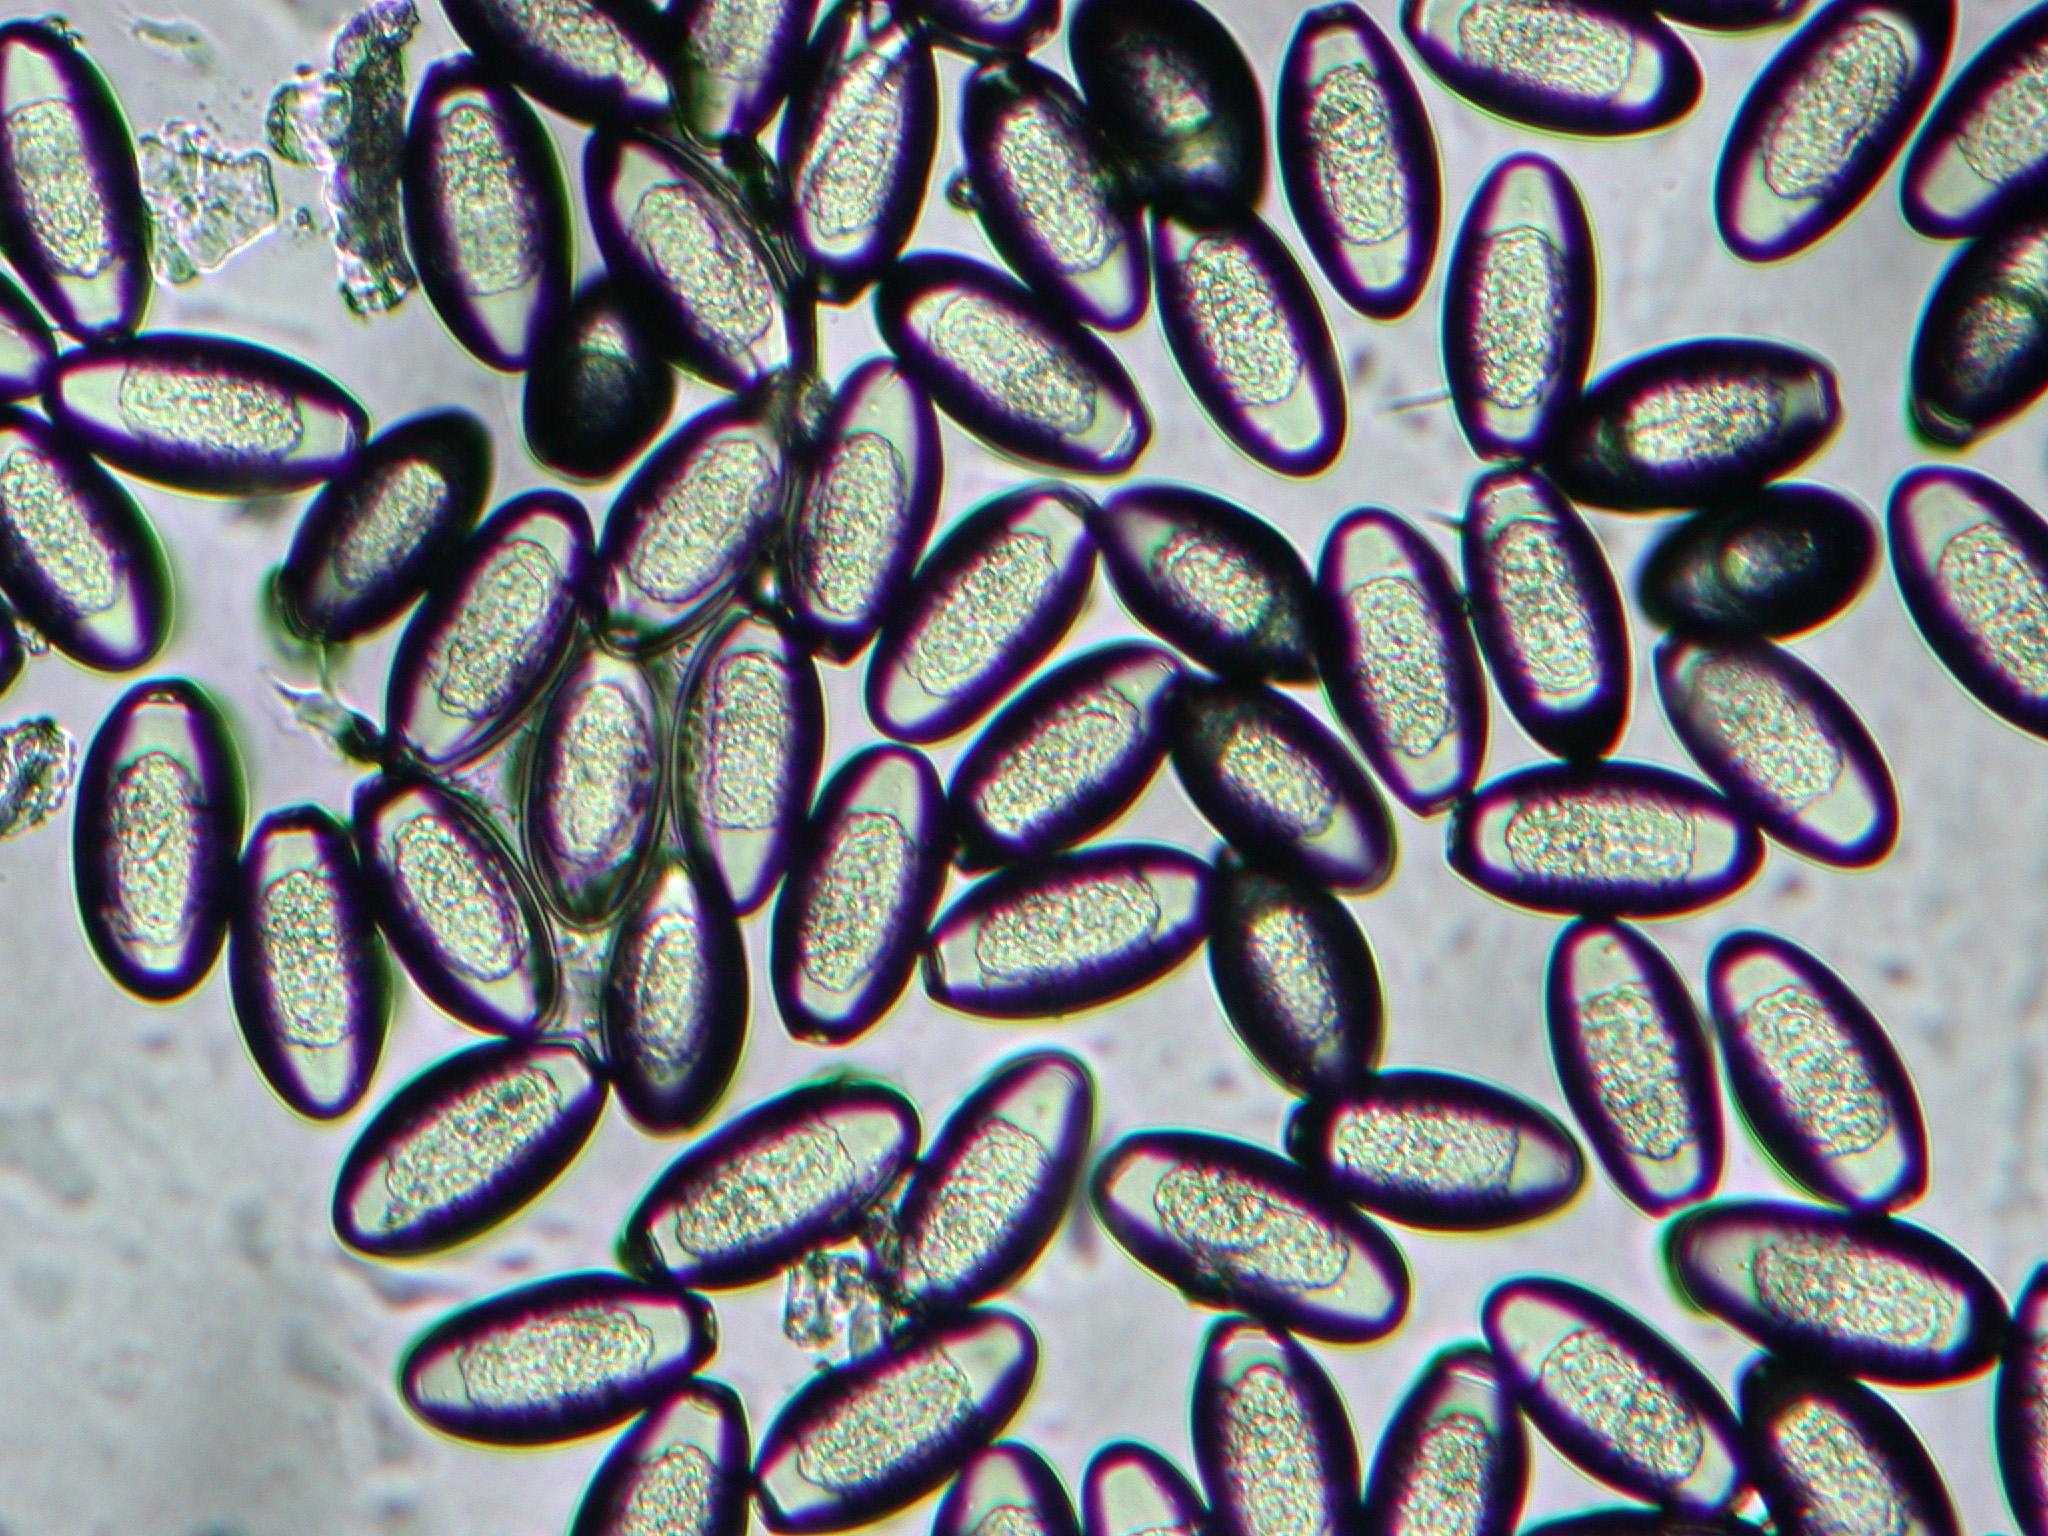 az a pinworms